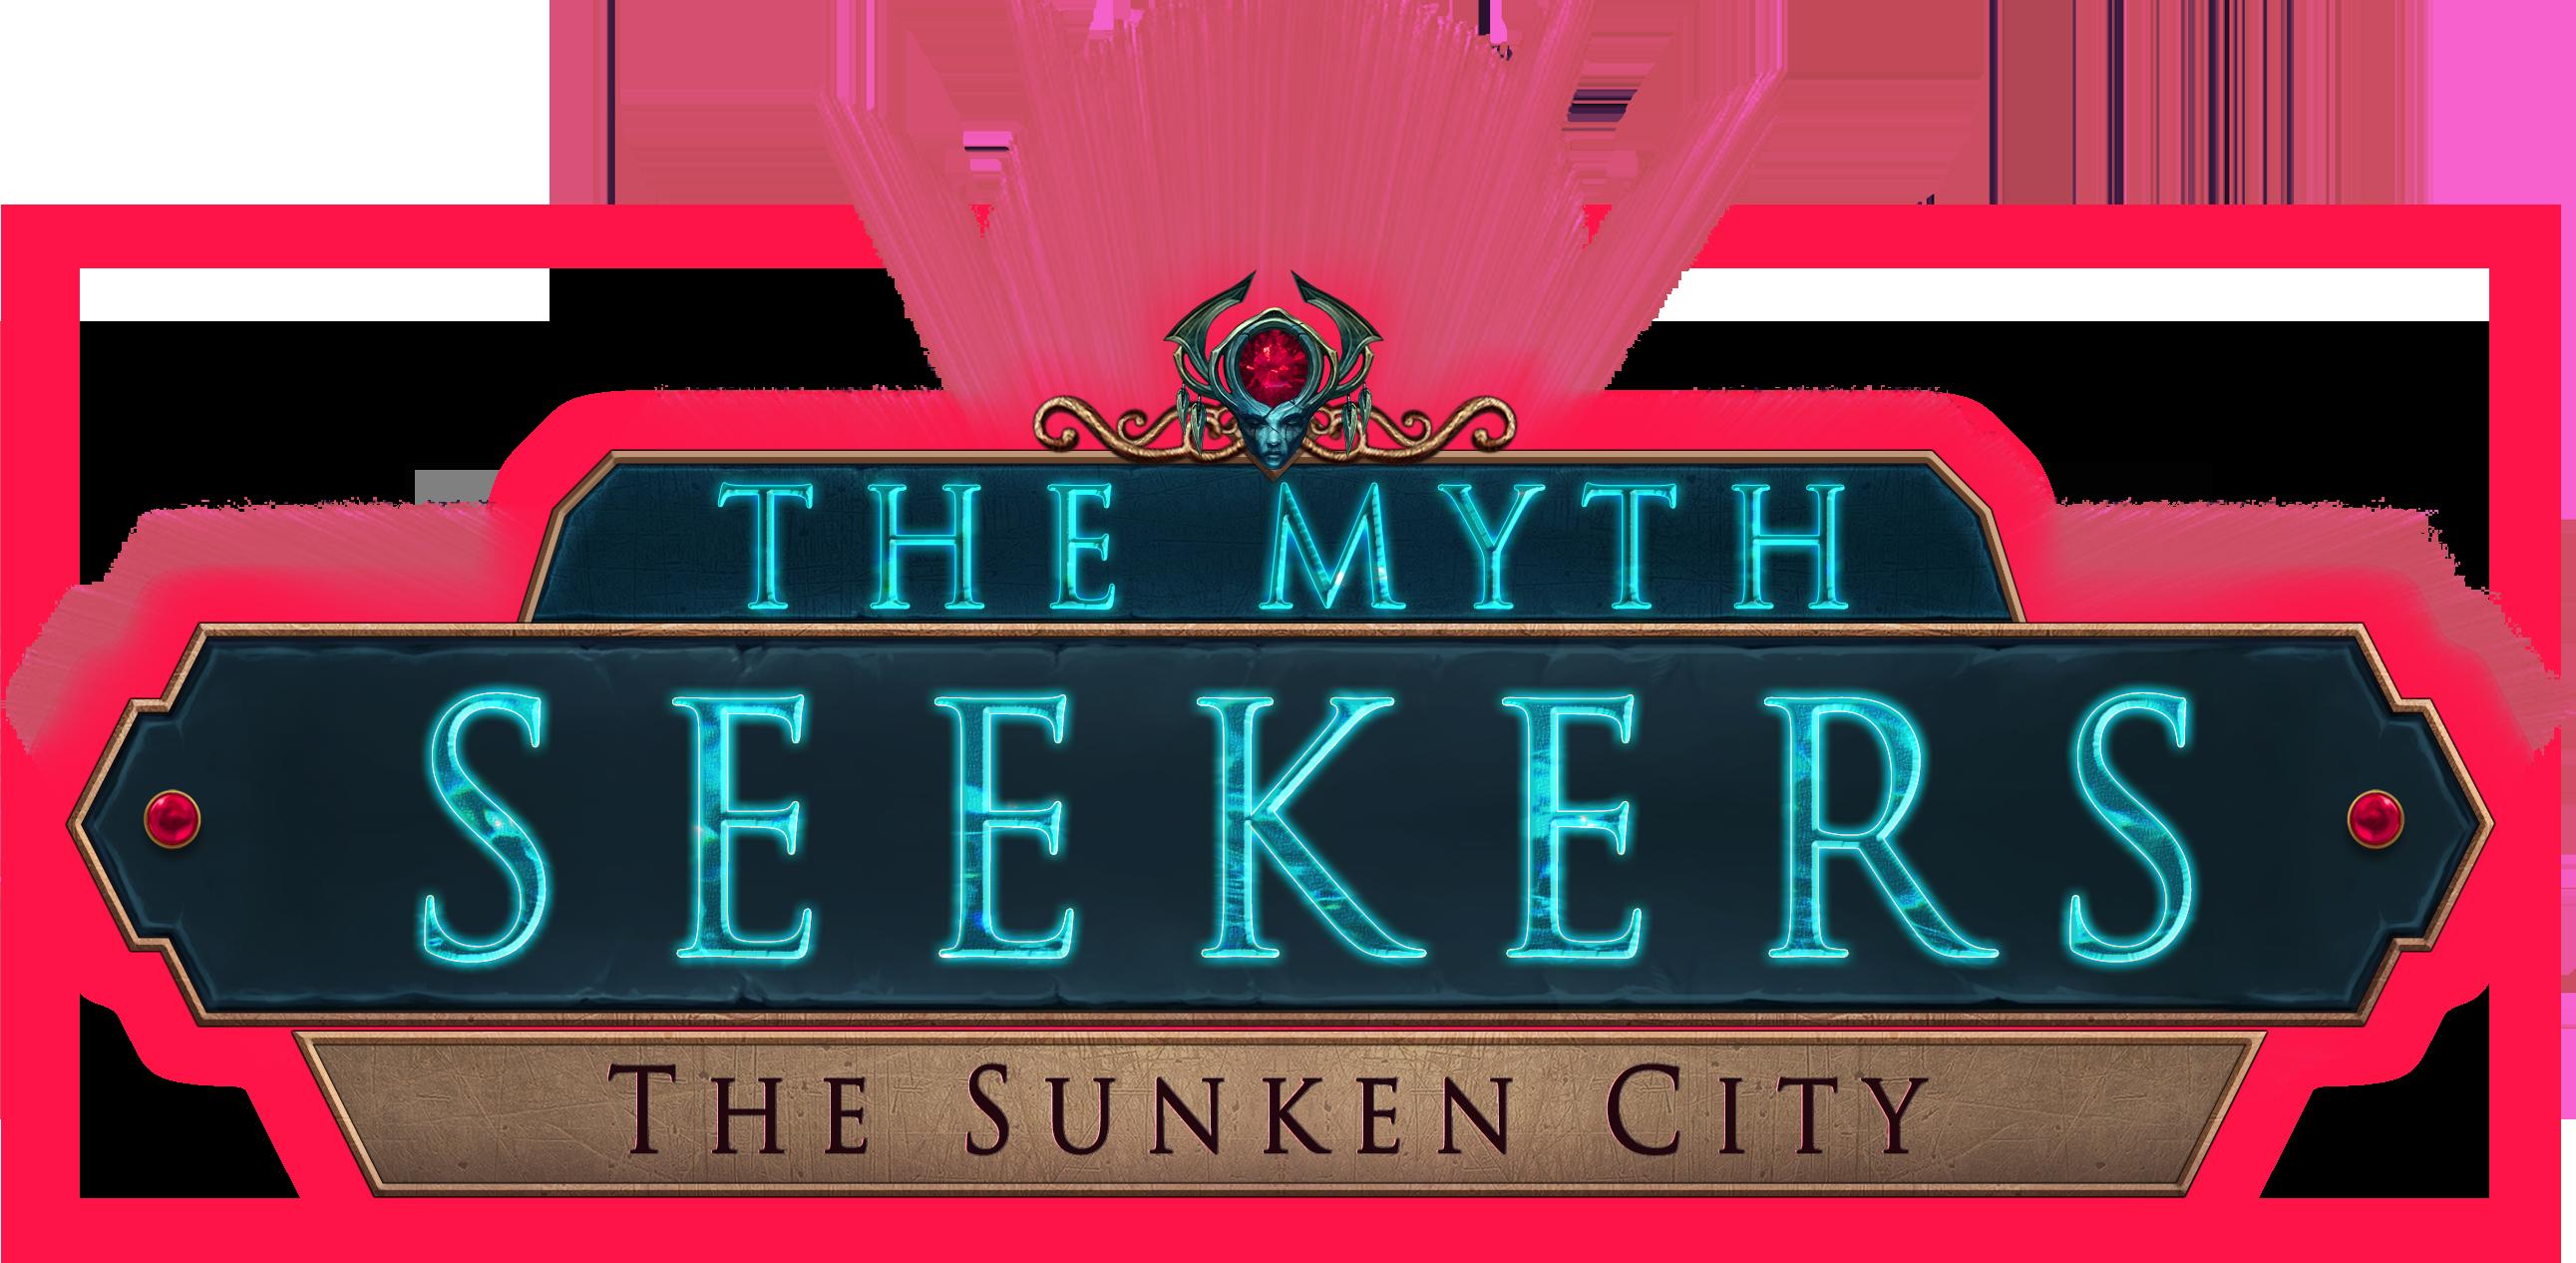 The Myth Seekers 2: The Sunken City [BETA]